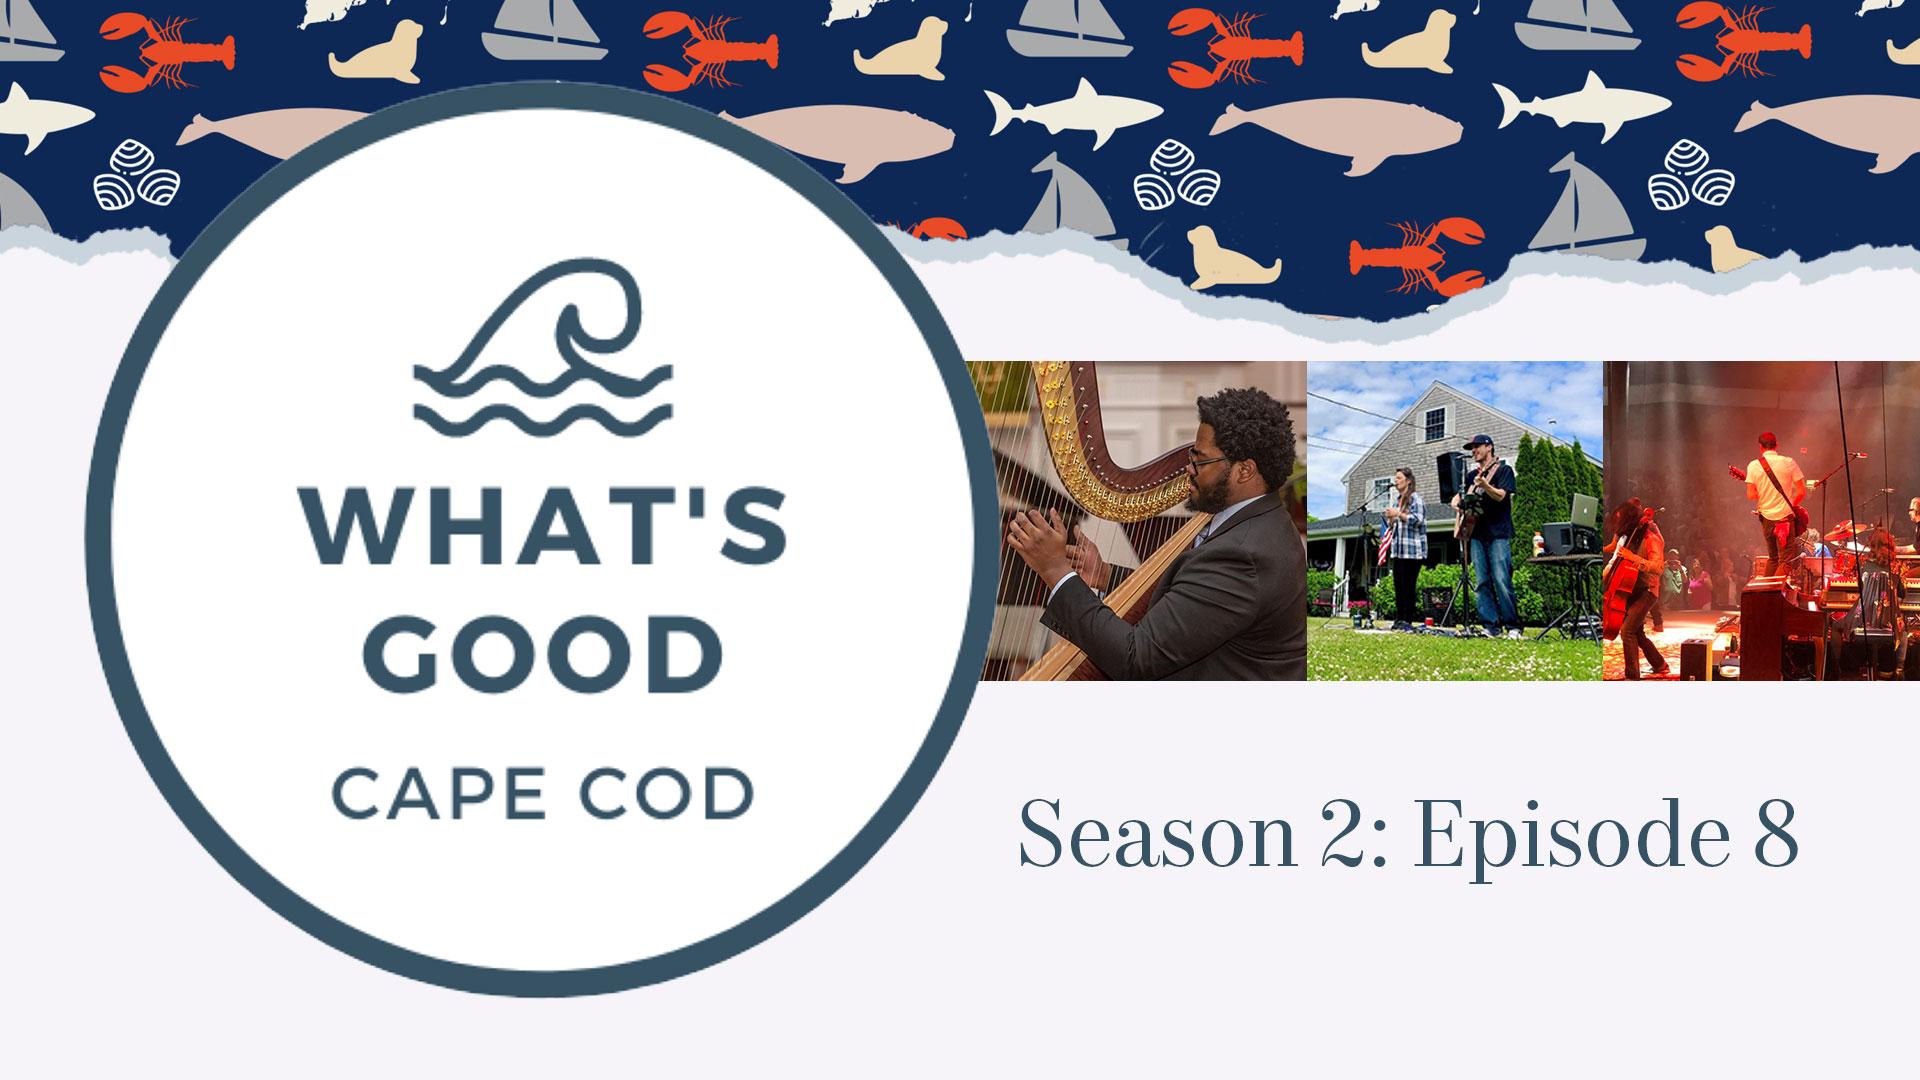 What's Good Cape Cod Season 2 Episode 8